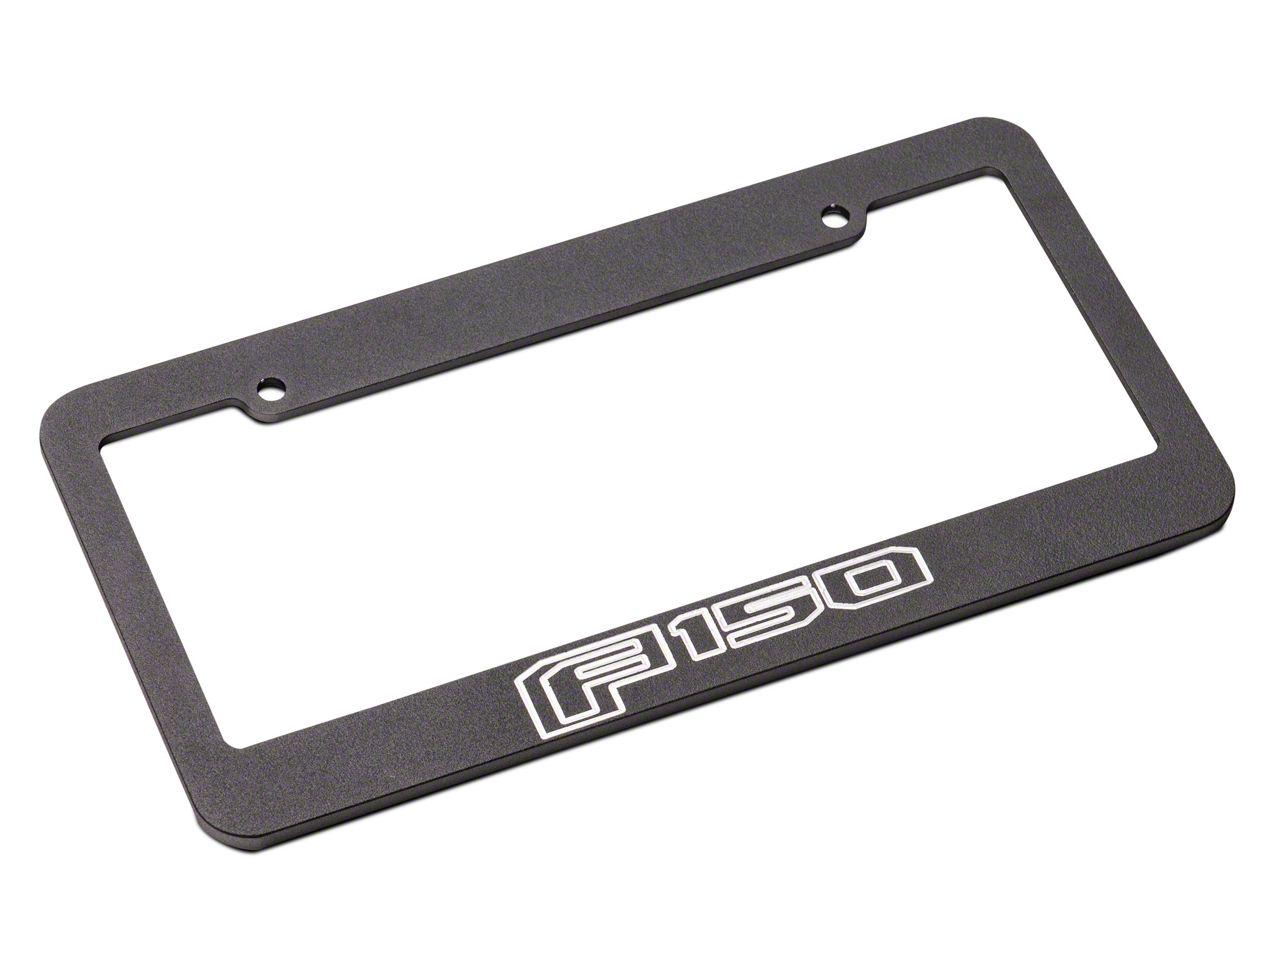 Defenderworx Black License Plate Frame w/ 2015 Style F-150 Logo (97-18 F-150)